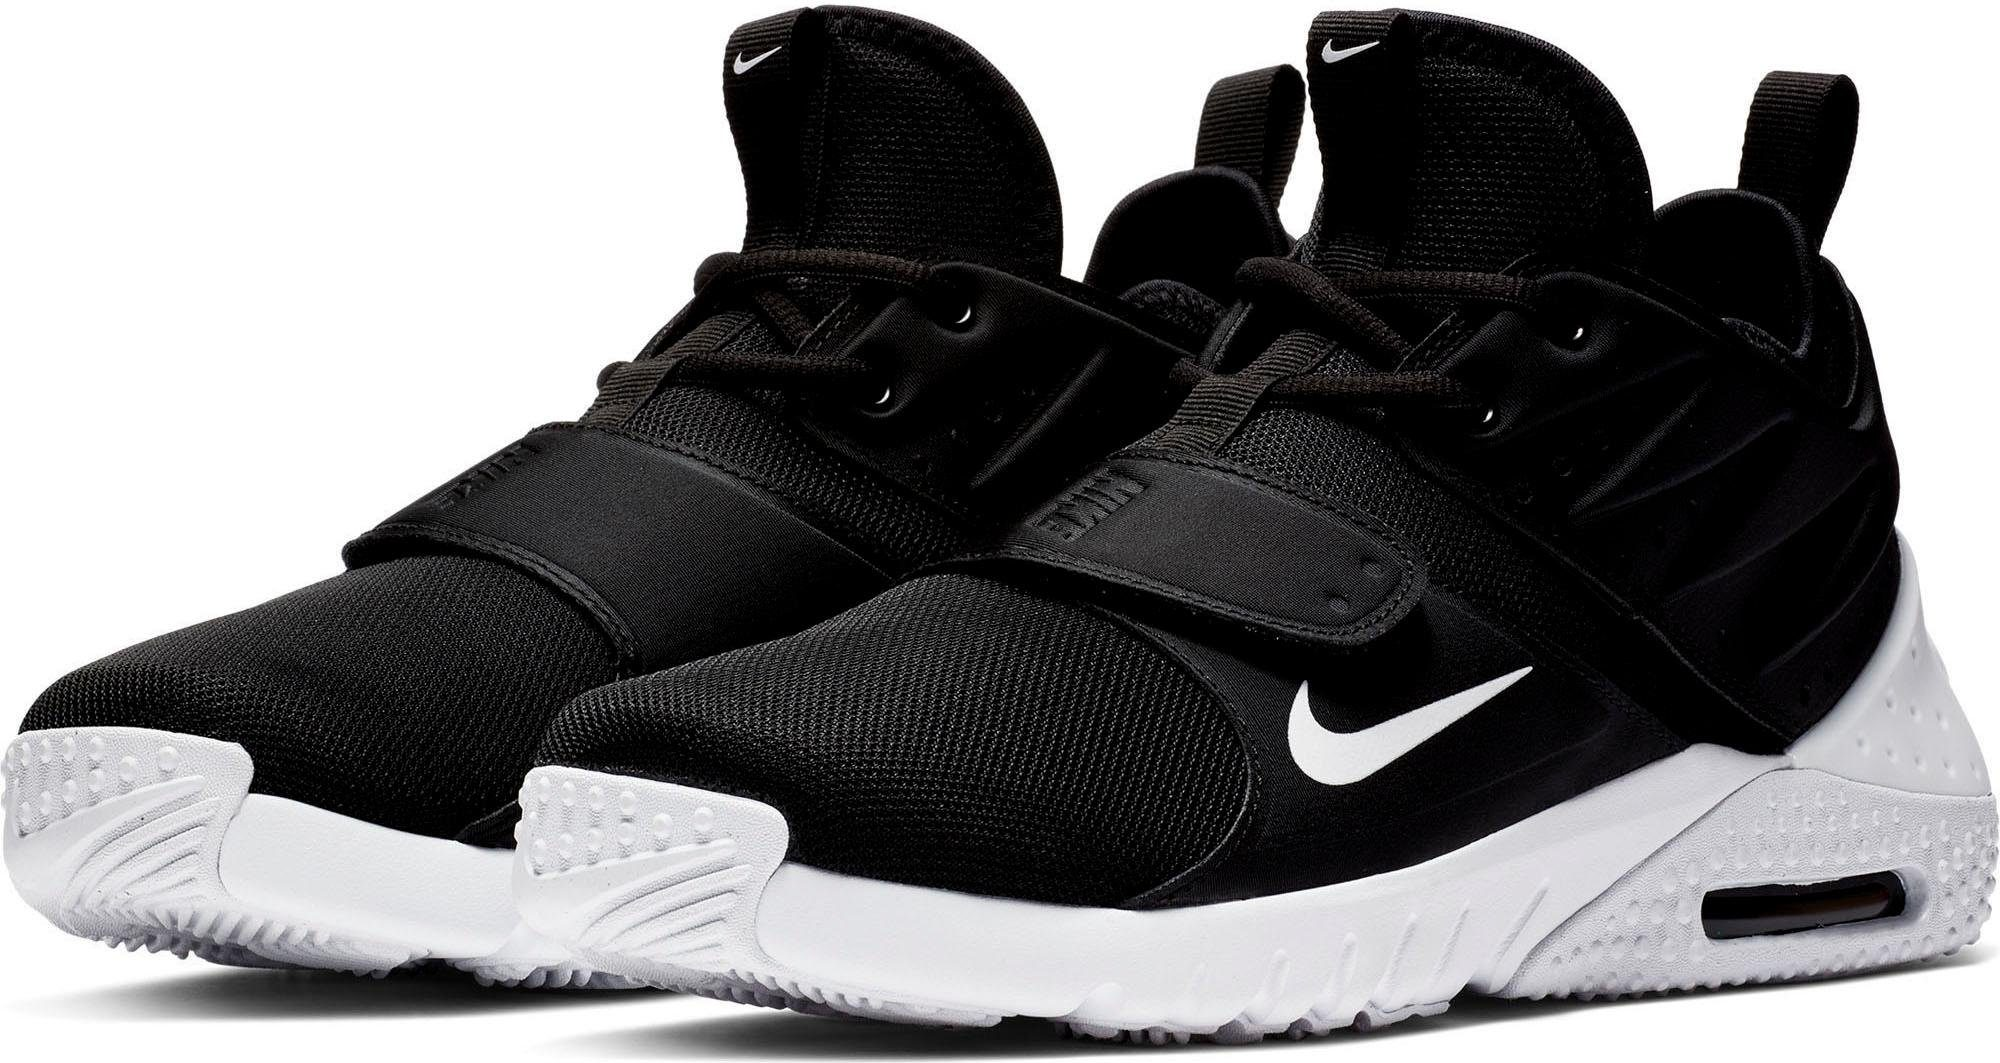 Nike Herren Trainingsschuh Air Max Trainer 1 Laufschuhe